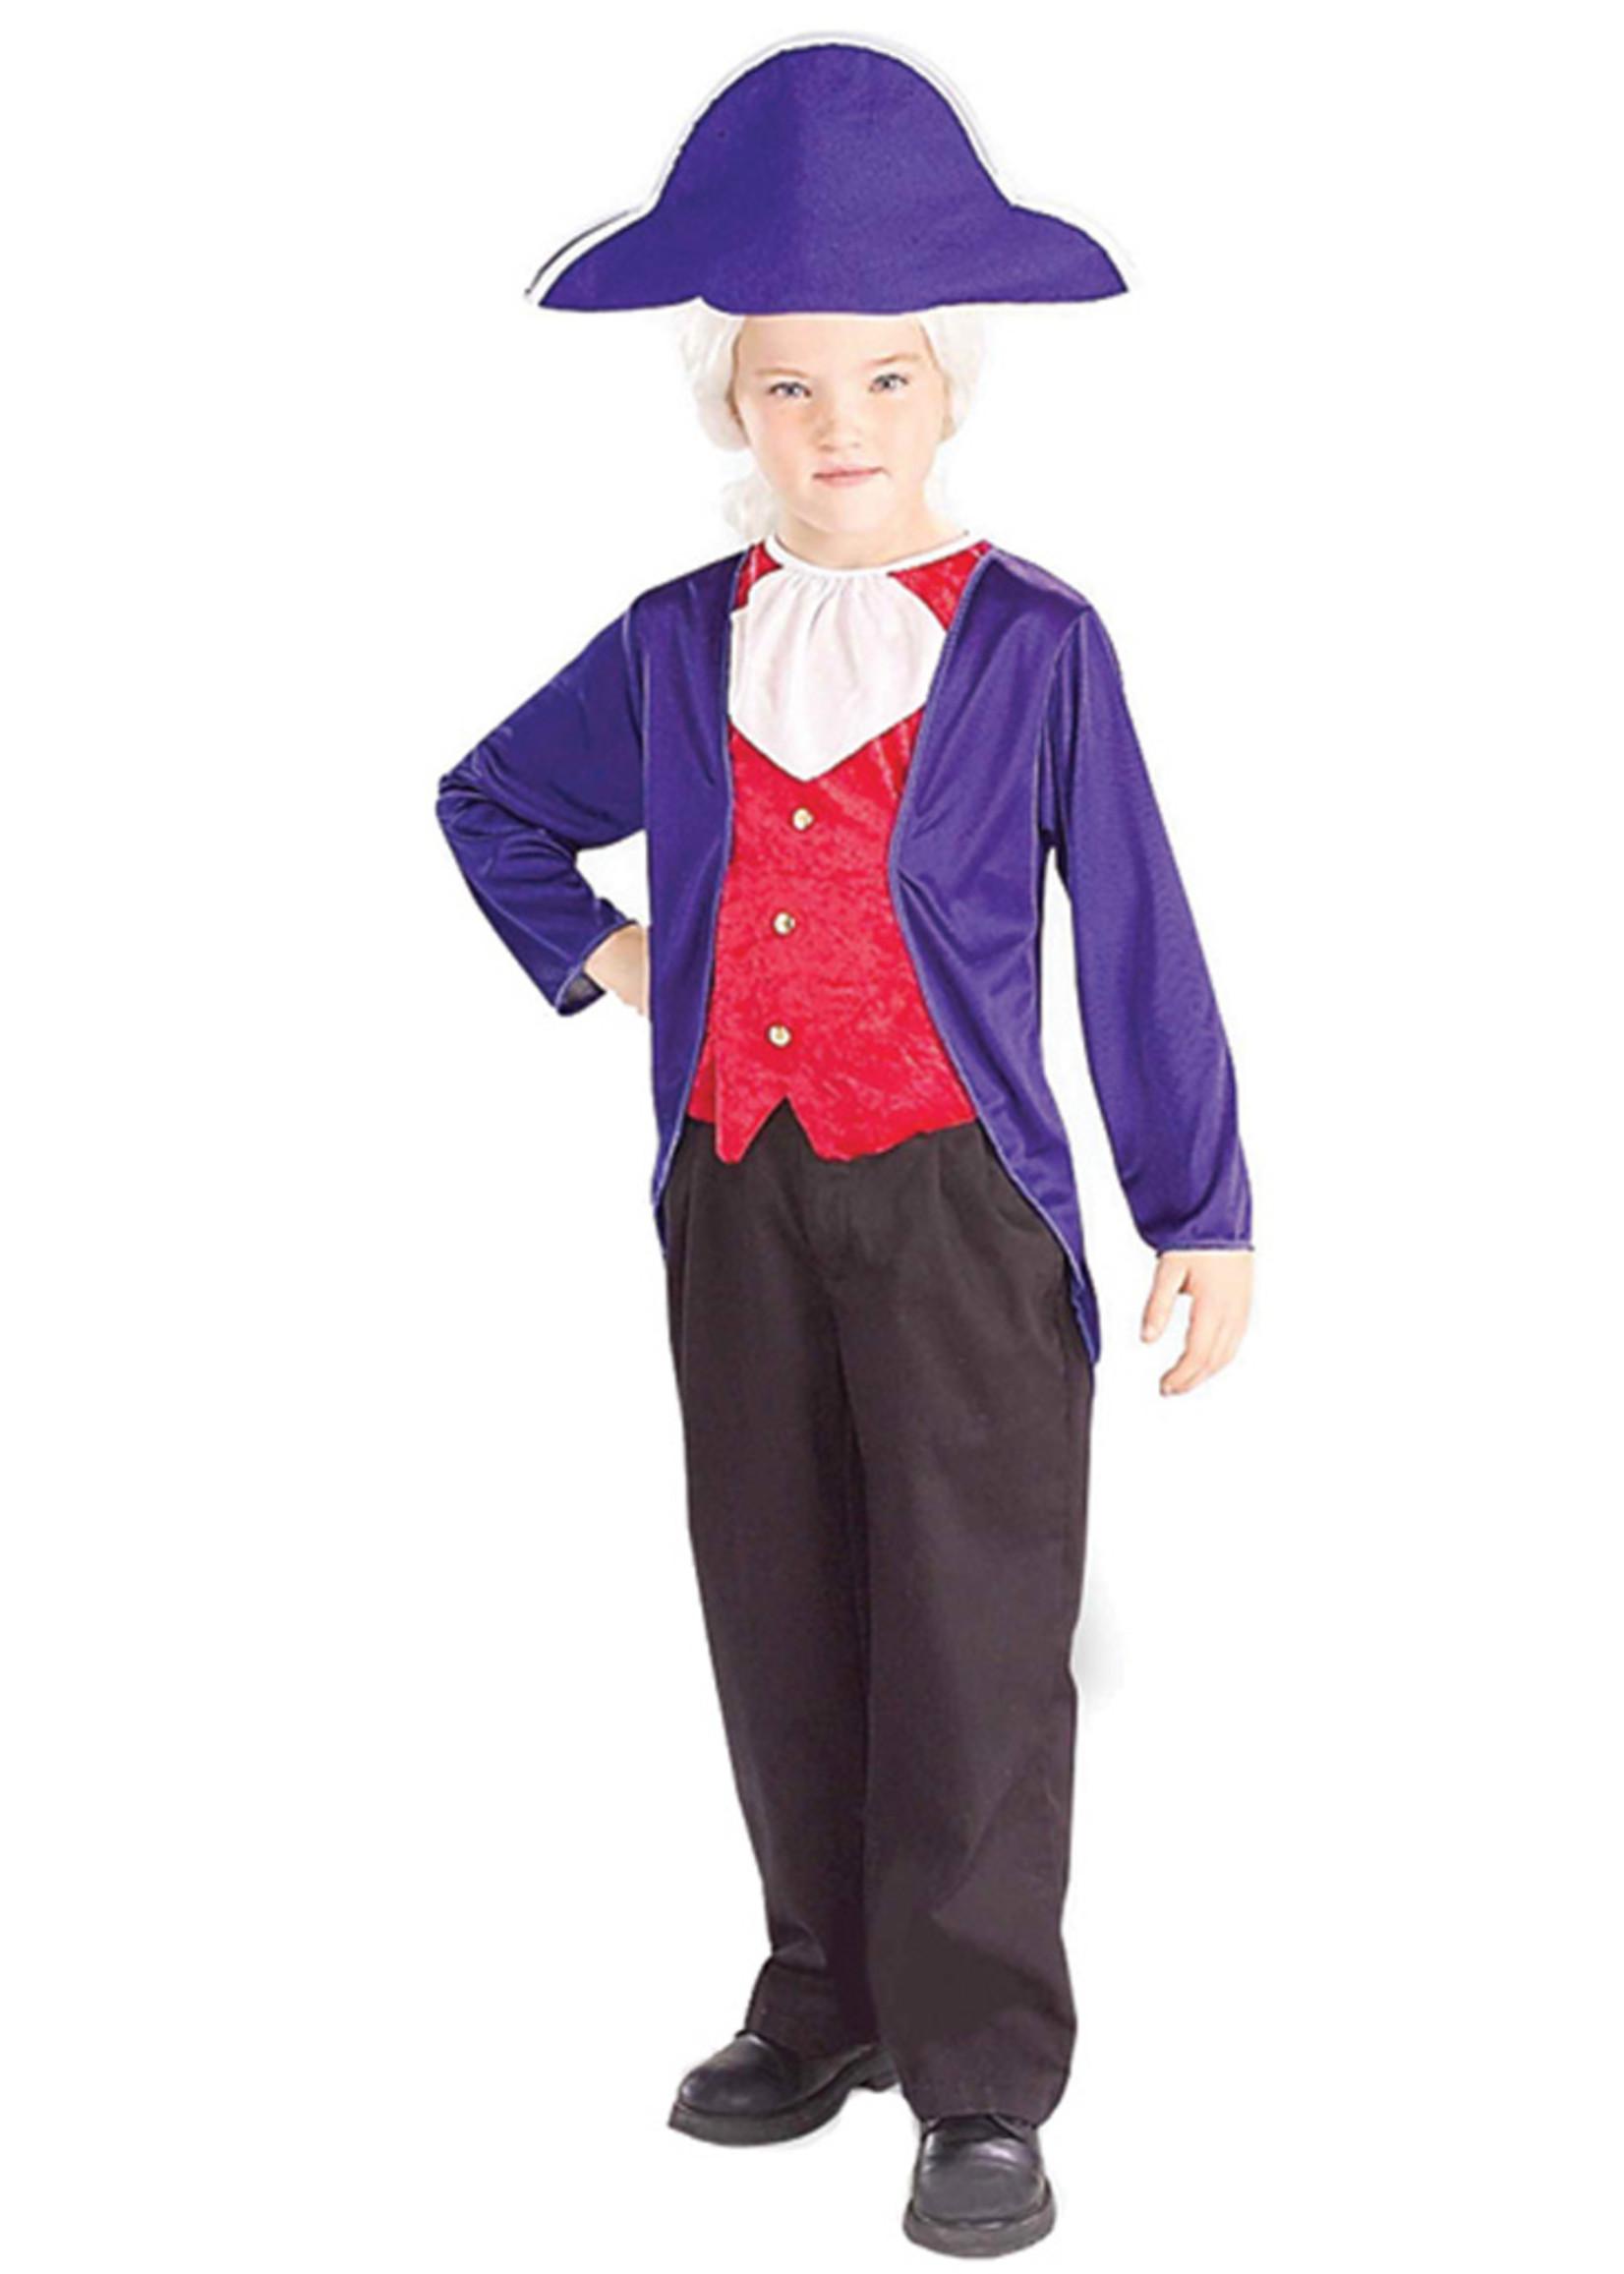 George Washington Costume - Boy's